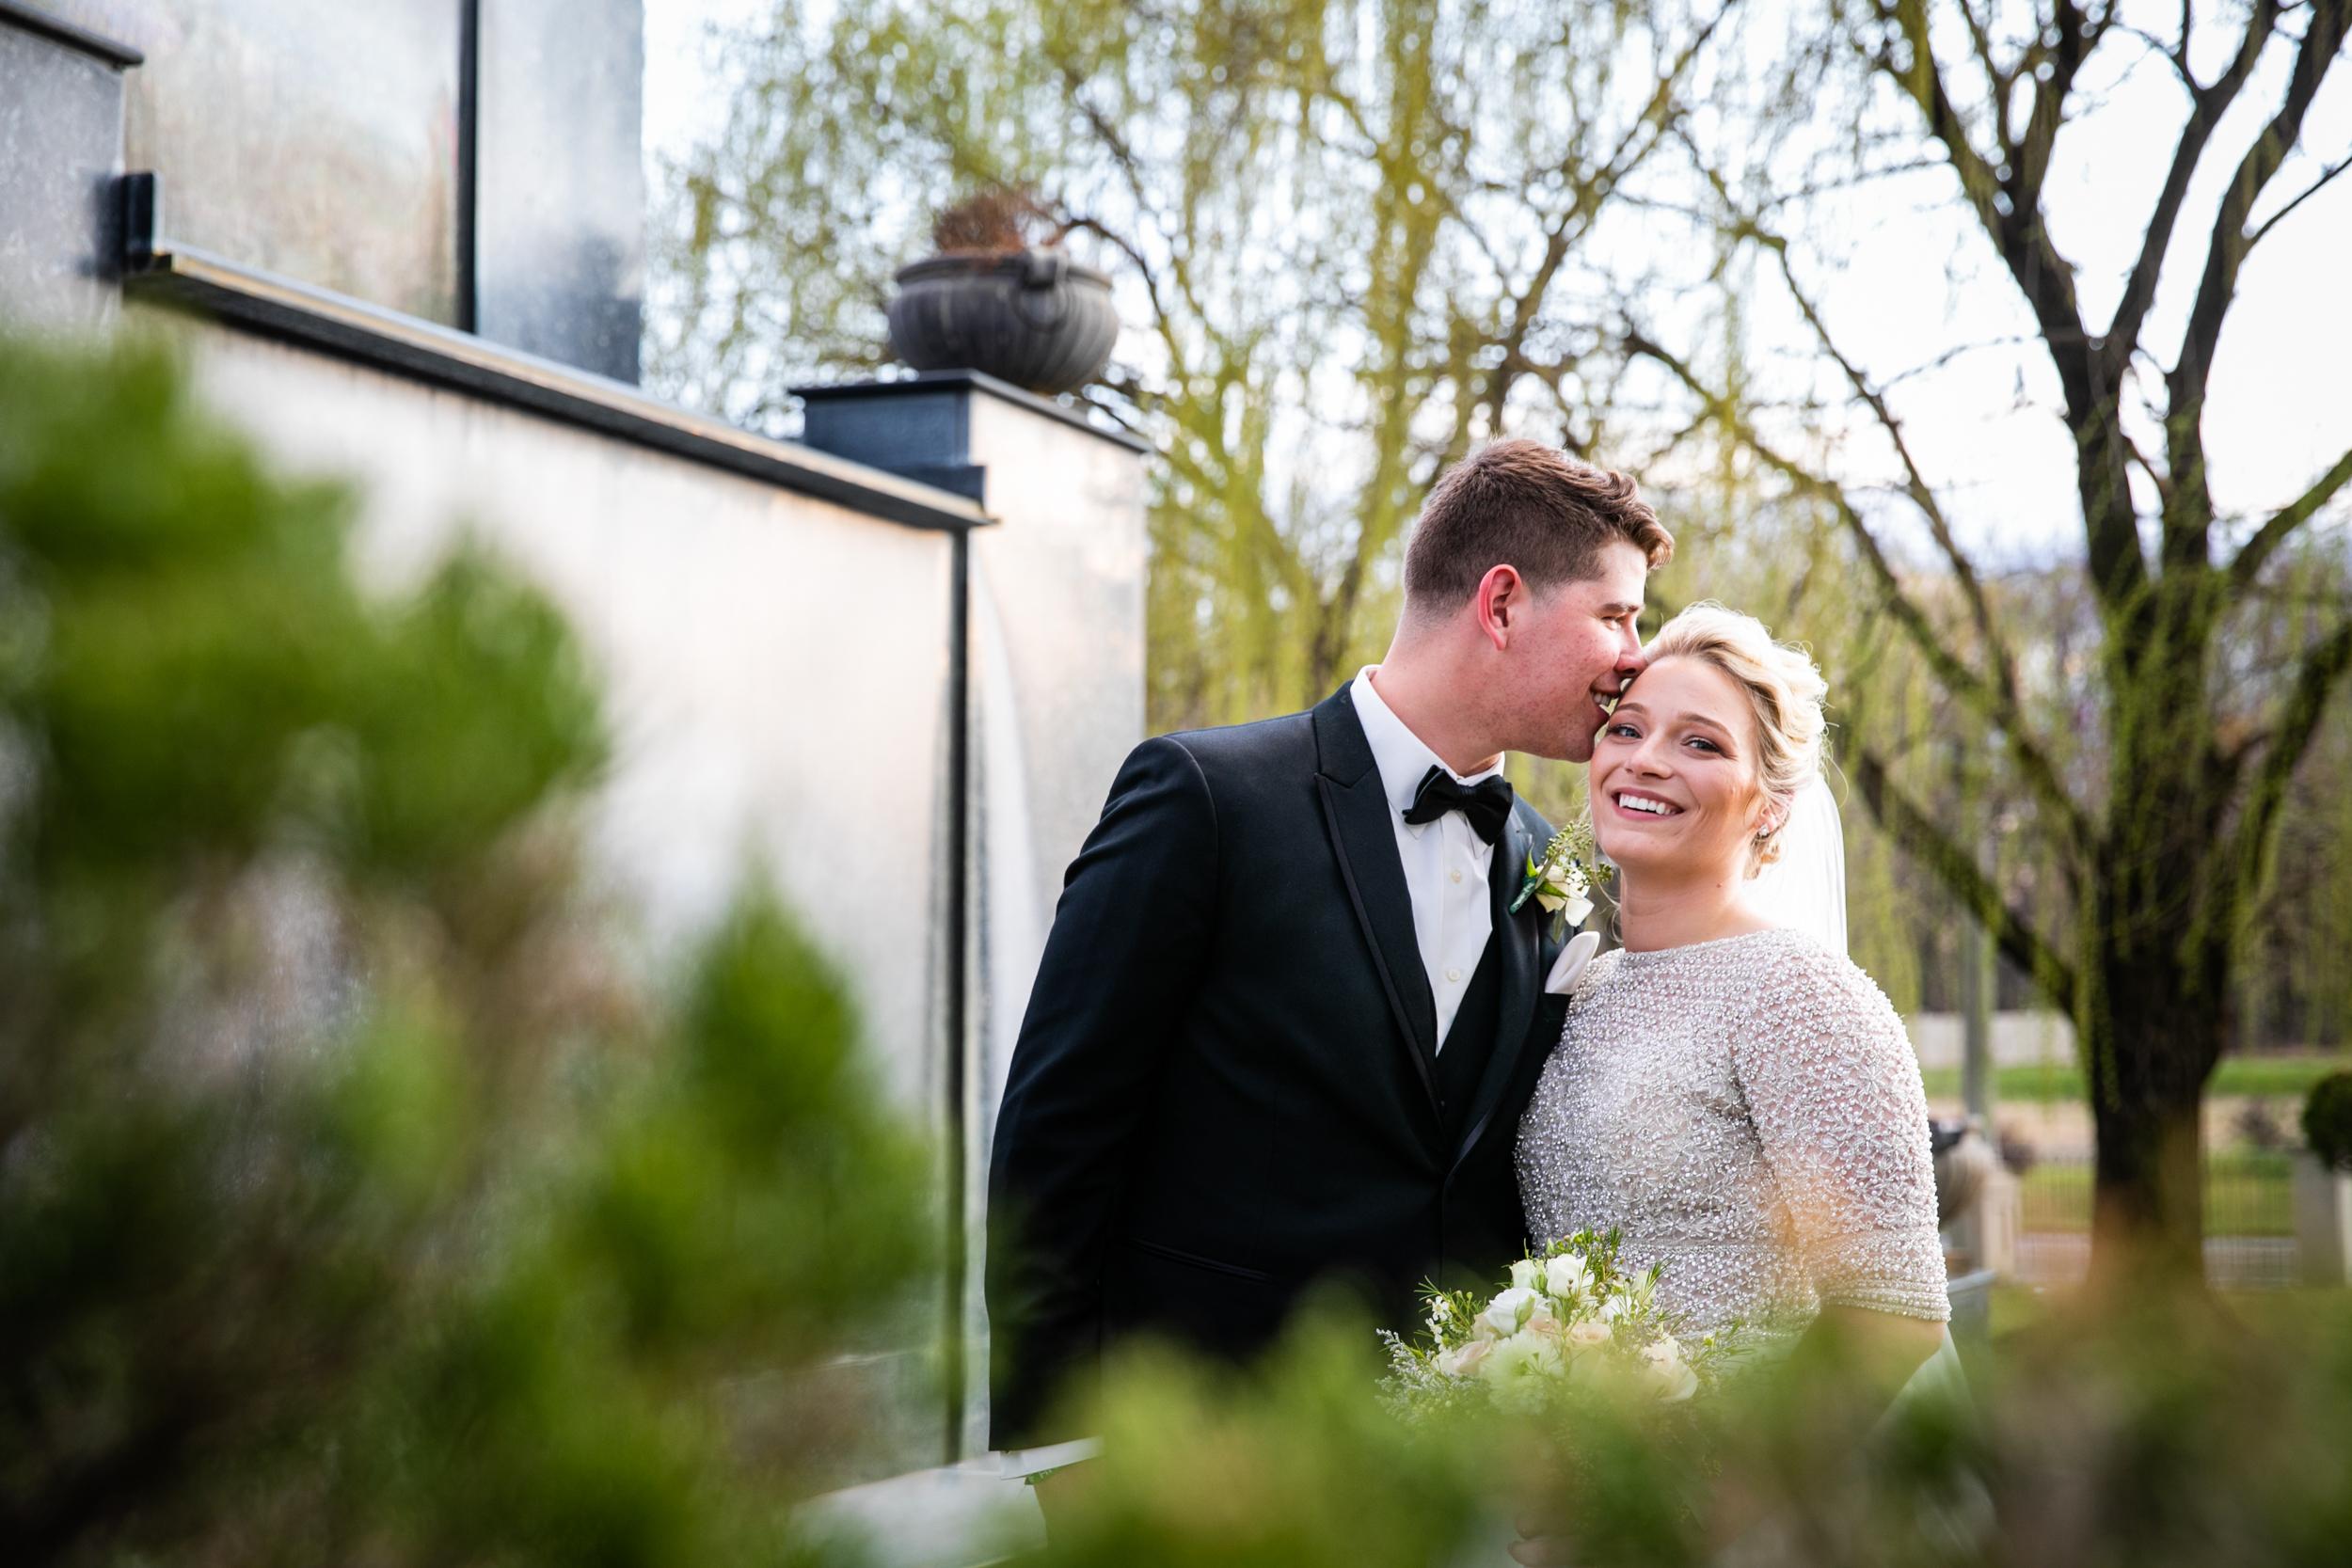 CELEBRATIONS BENSALEM WEDDING PHOTOGRAPHY-66.jpg